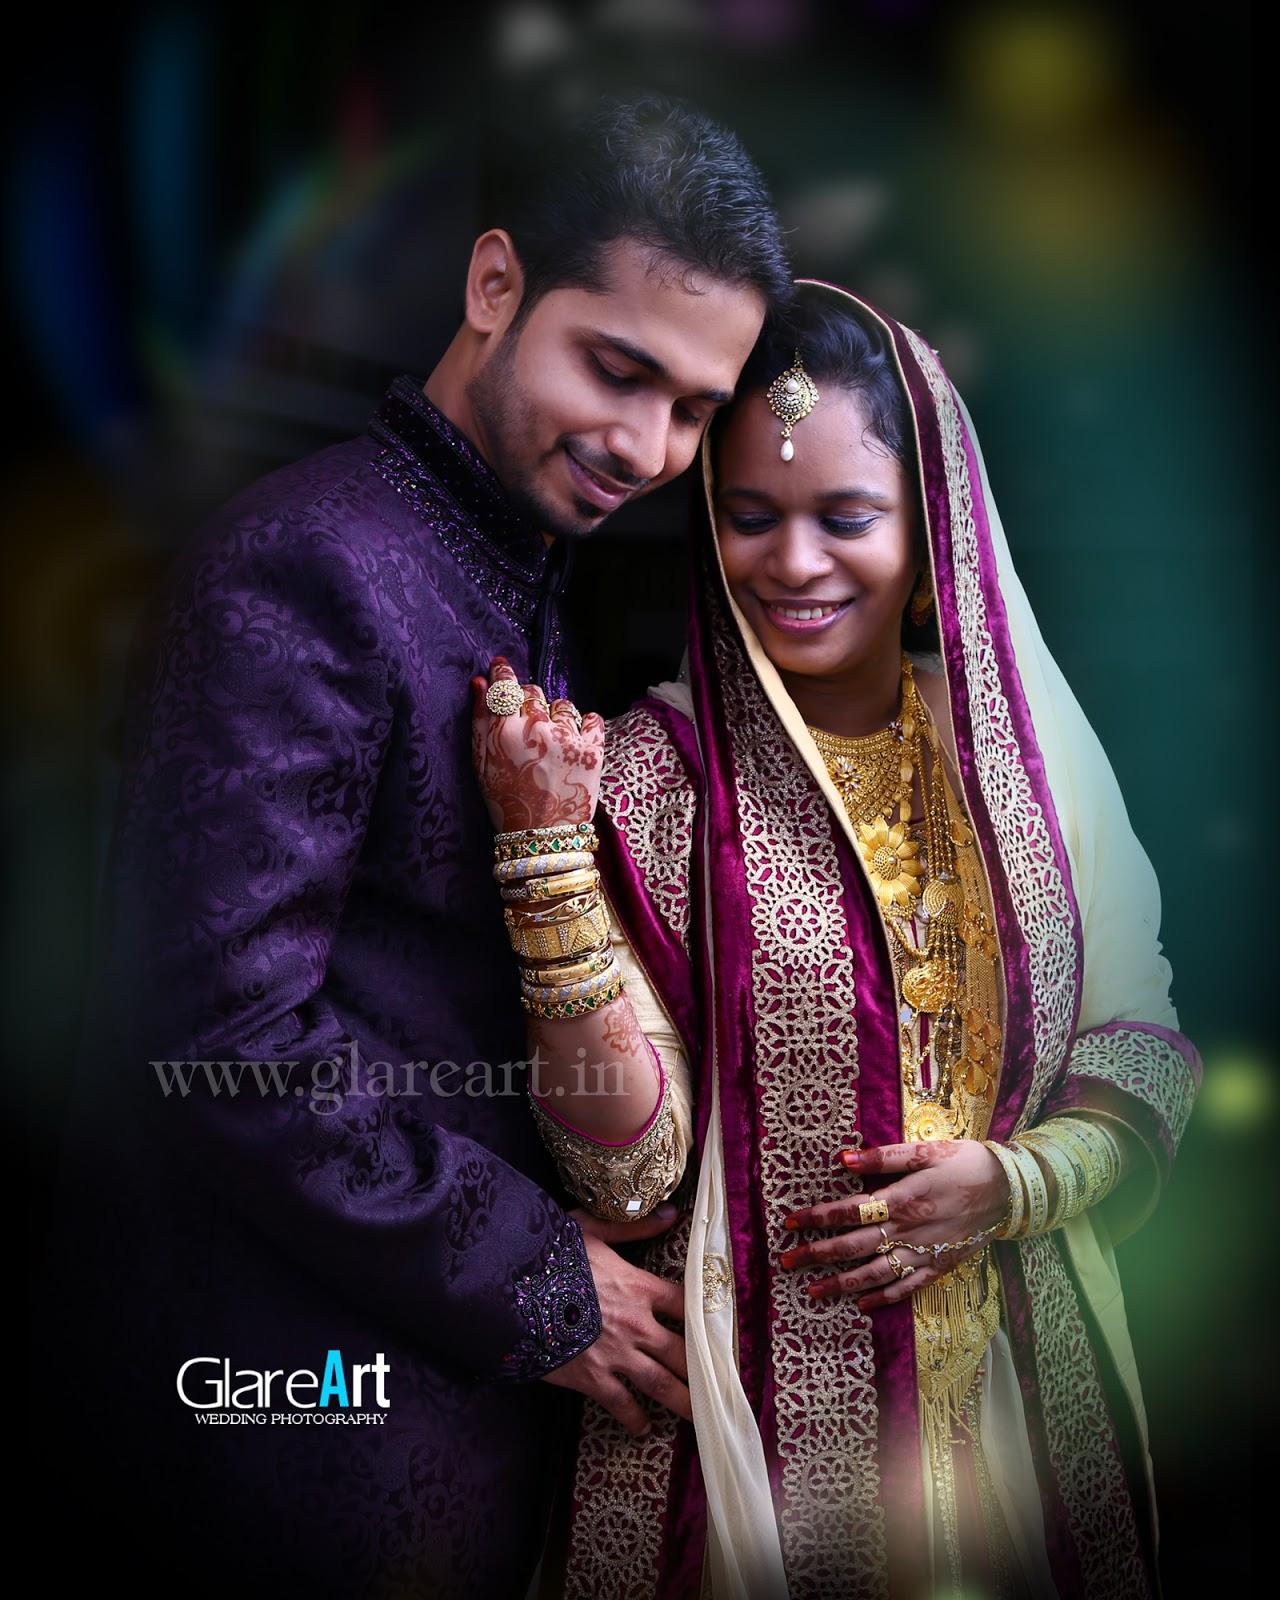 Kerala wedding photography - Kerala Wedding Photography At Palakkad